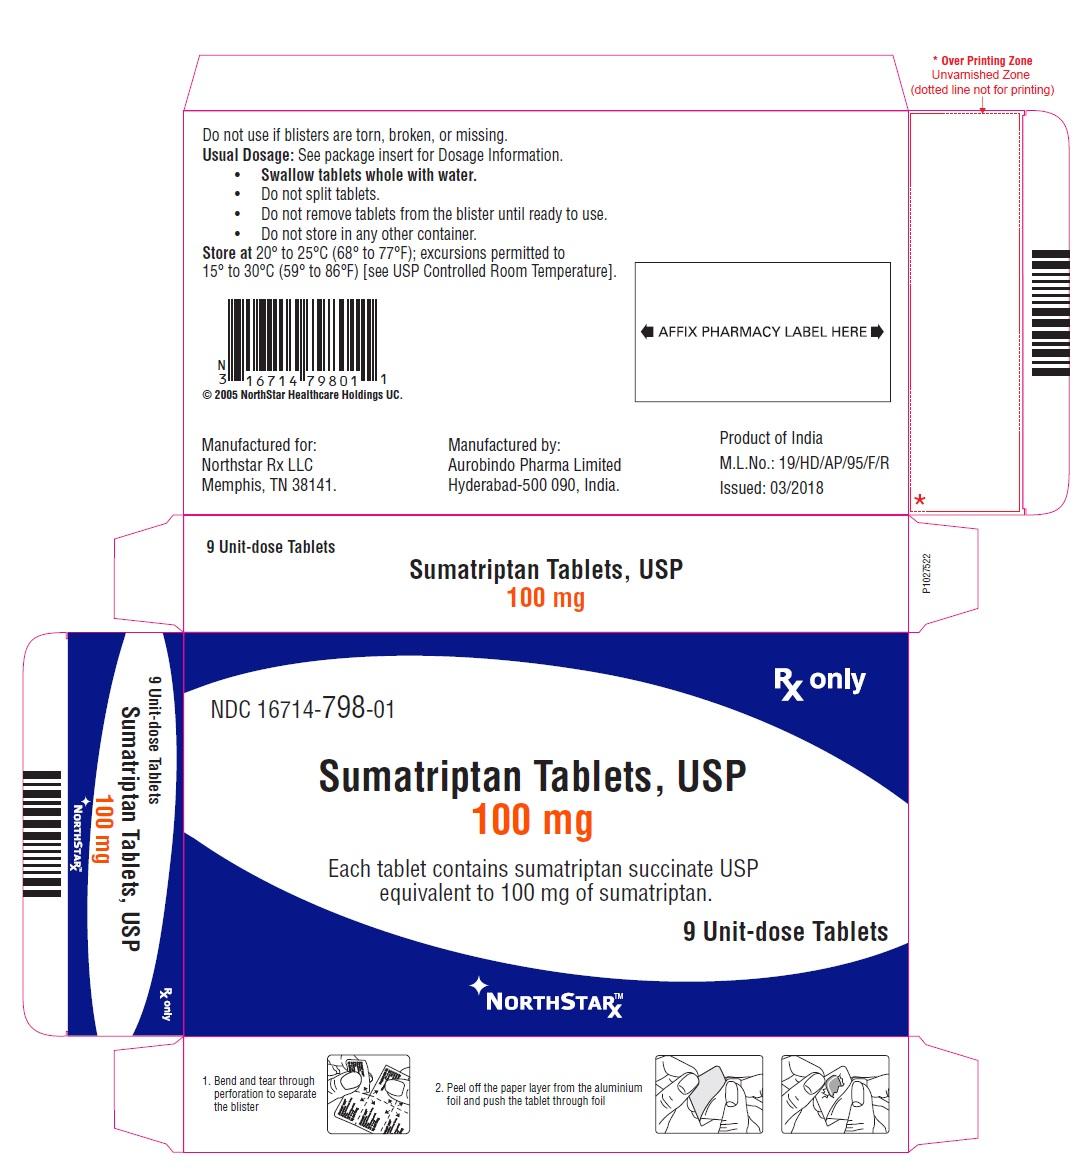 PACKAGE LABEL-PRINCIPAL DISPLAY PANEL - 100 mg Blister Carton (9 Unit-dose)